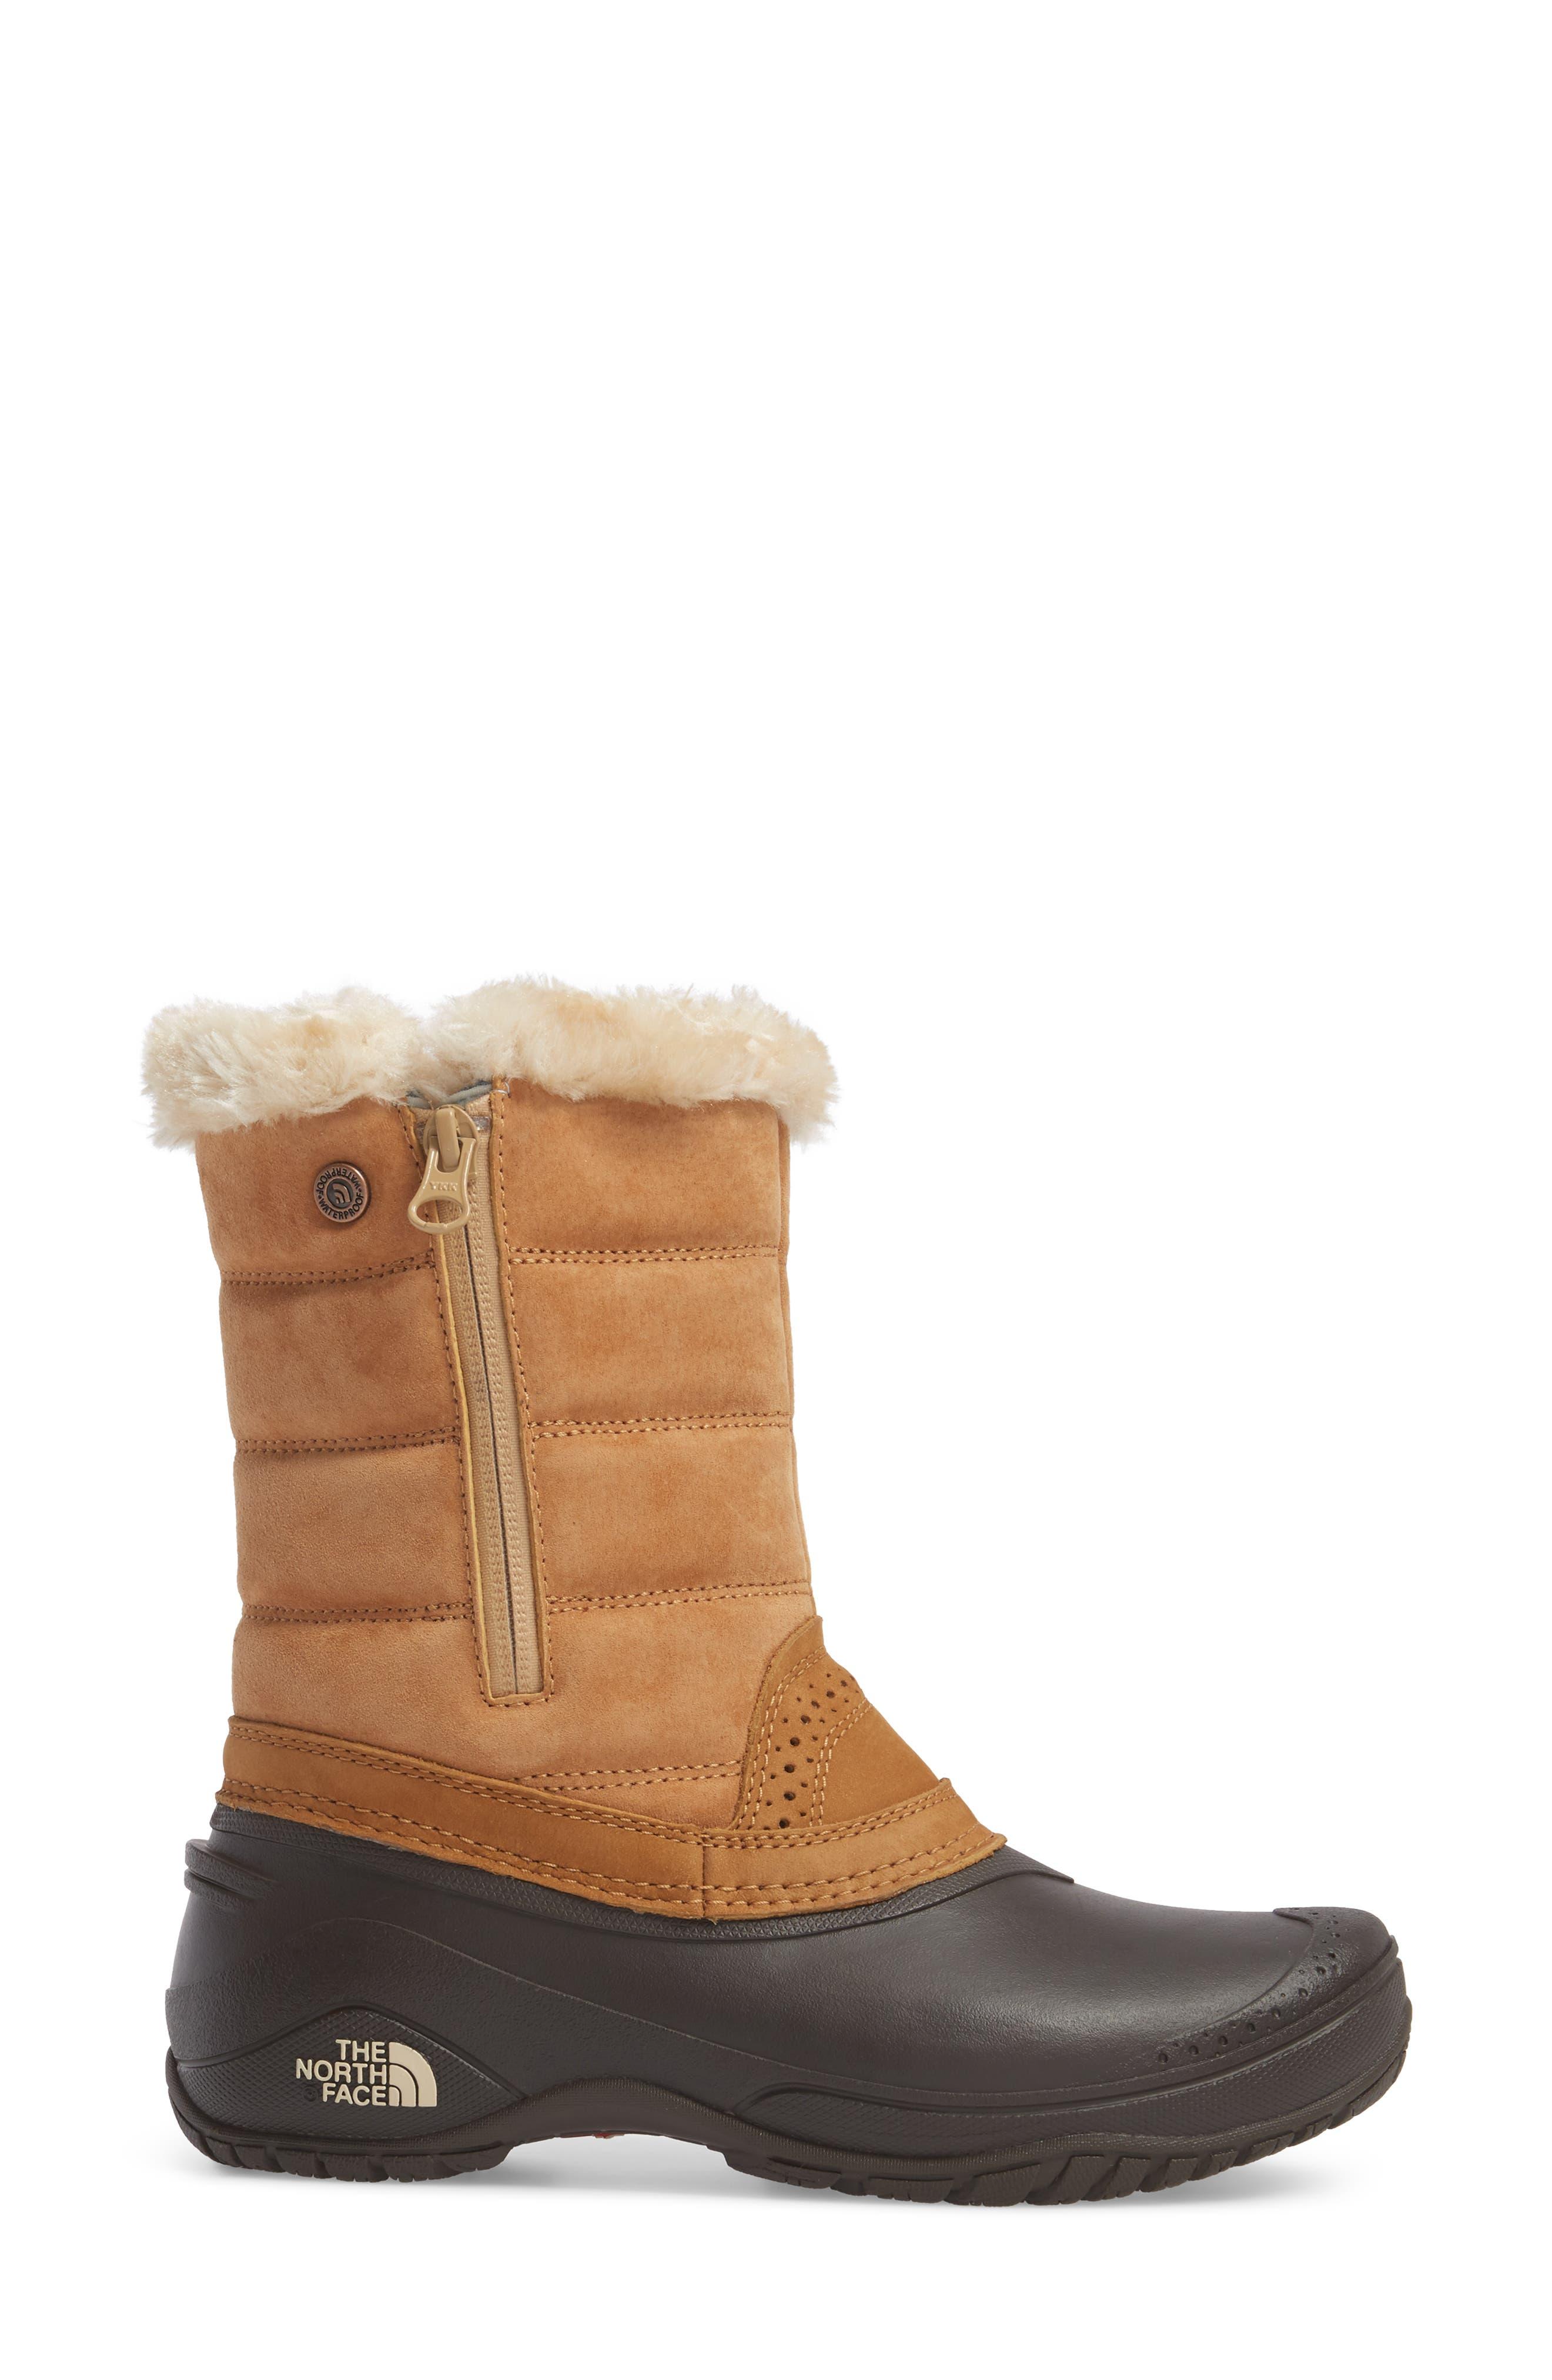 Shellista III Waterproof Pull-On Snow Boot,                             Alternate thumbnail 6, color,